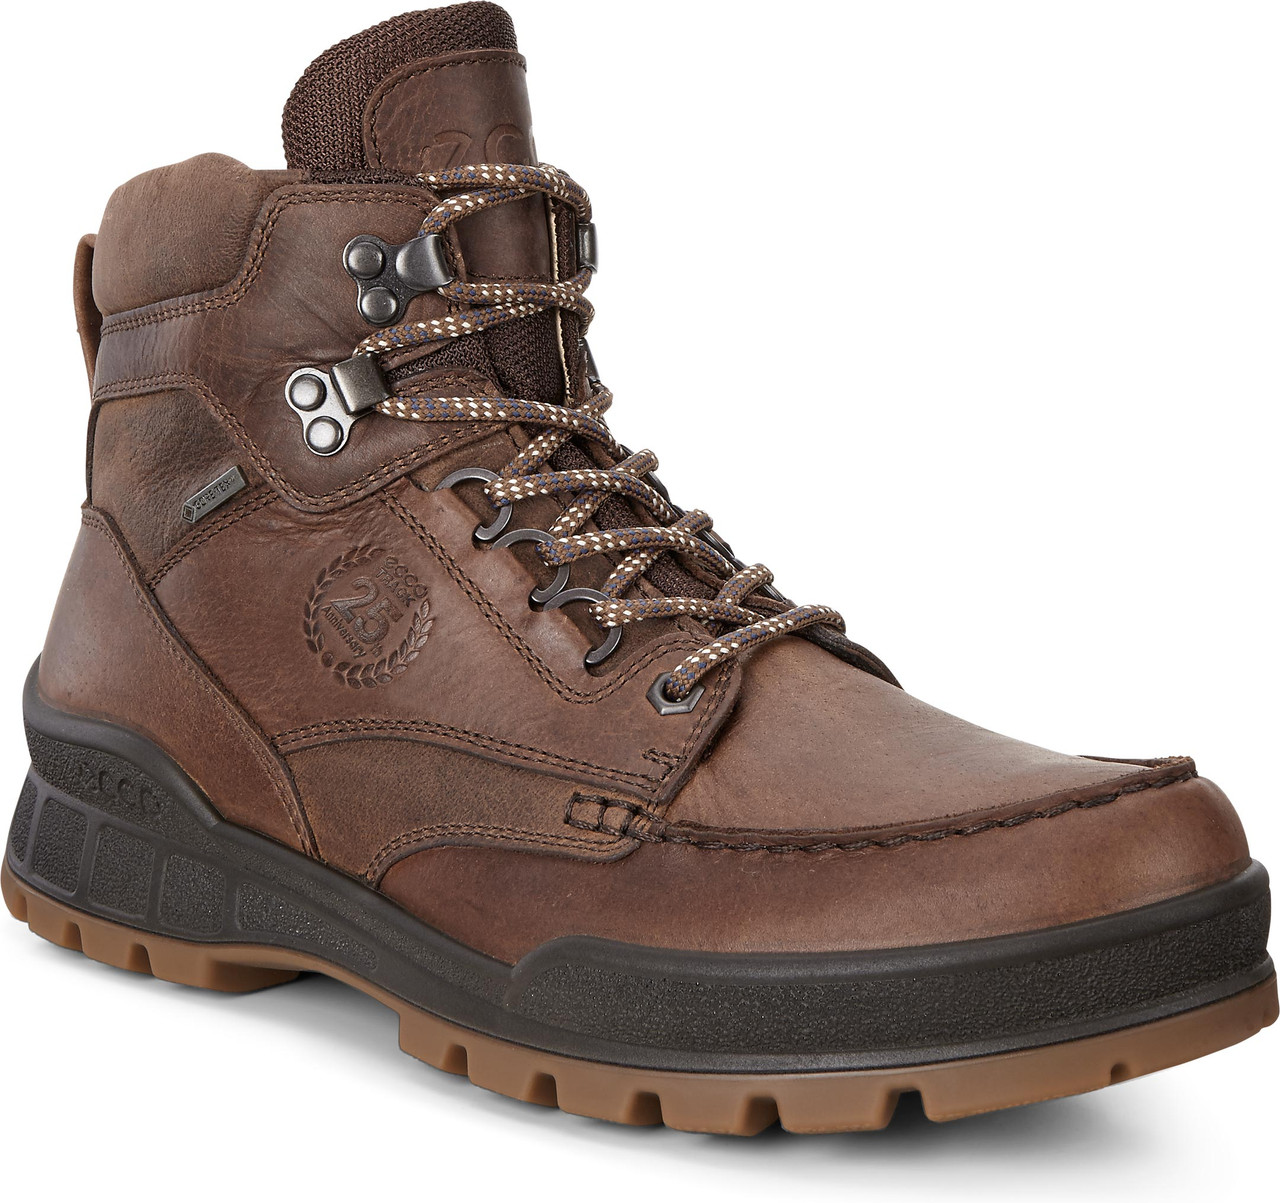 ecco work boots mens \u003e Clearance shop